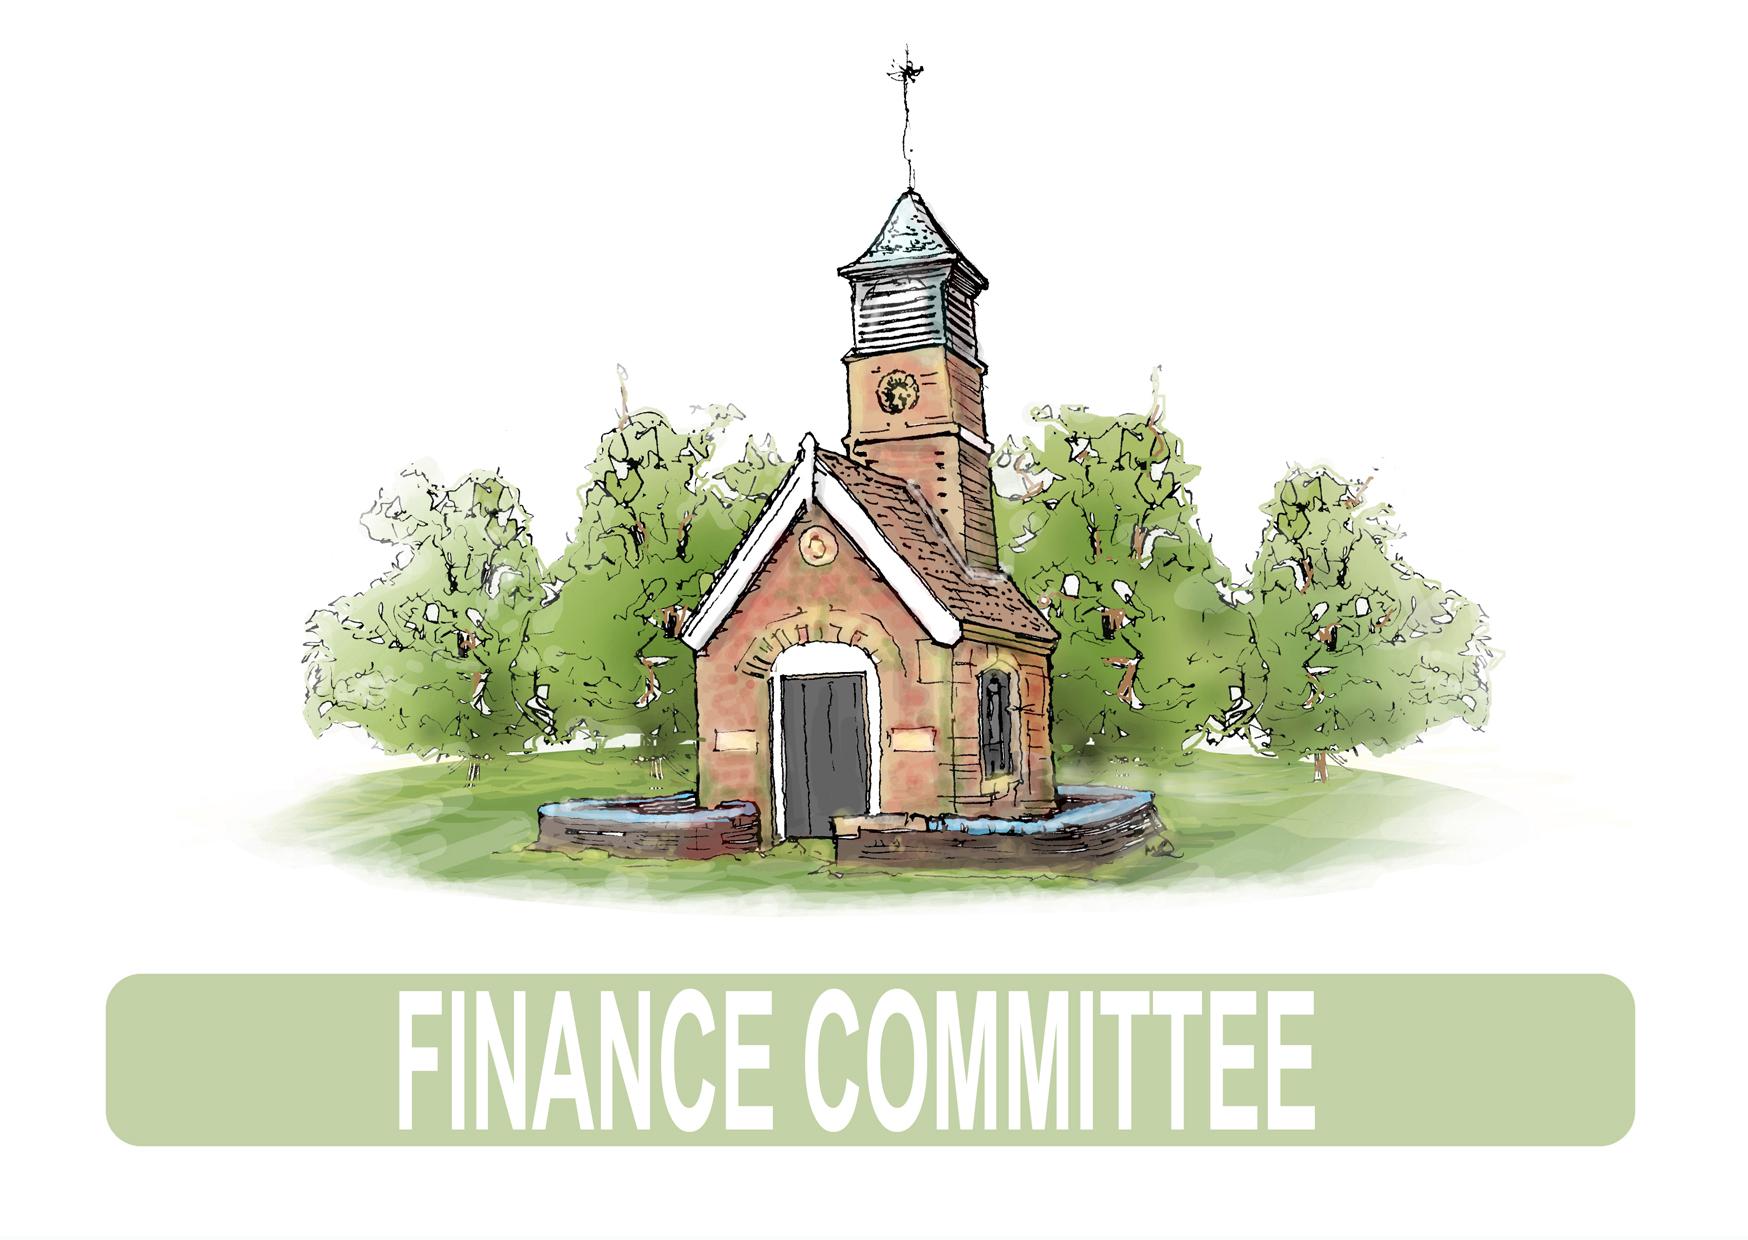 Finance Committee logo